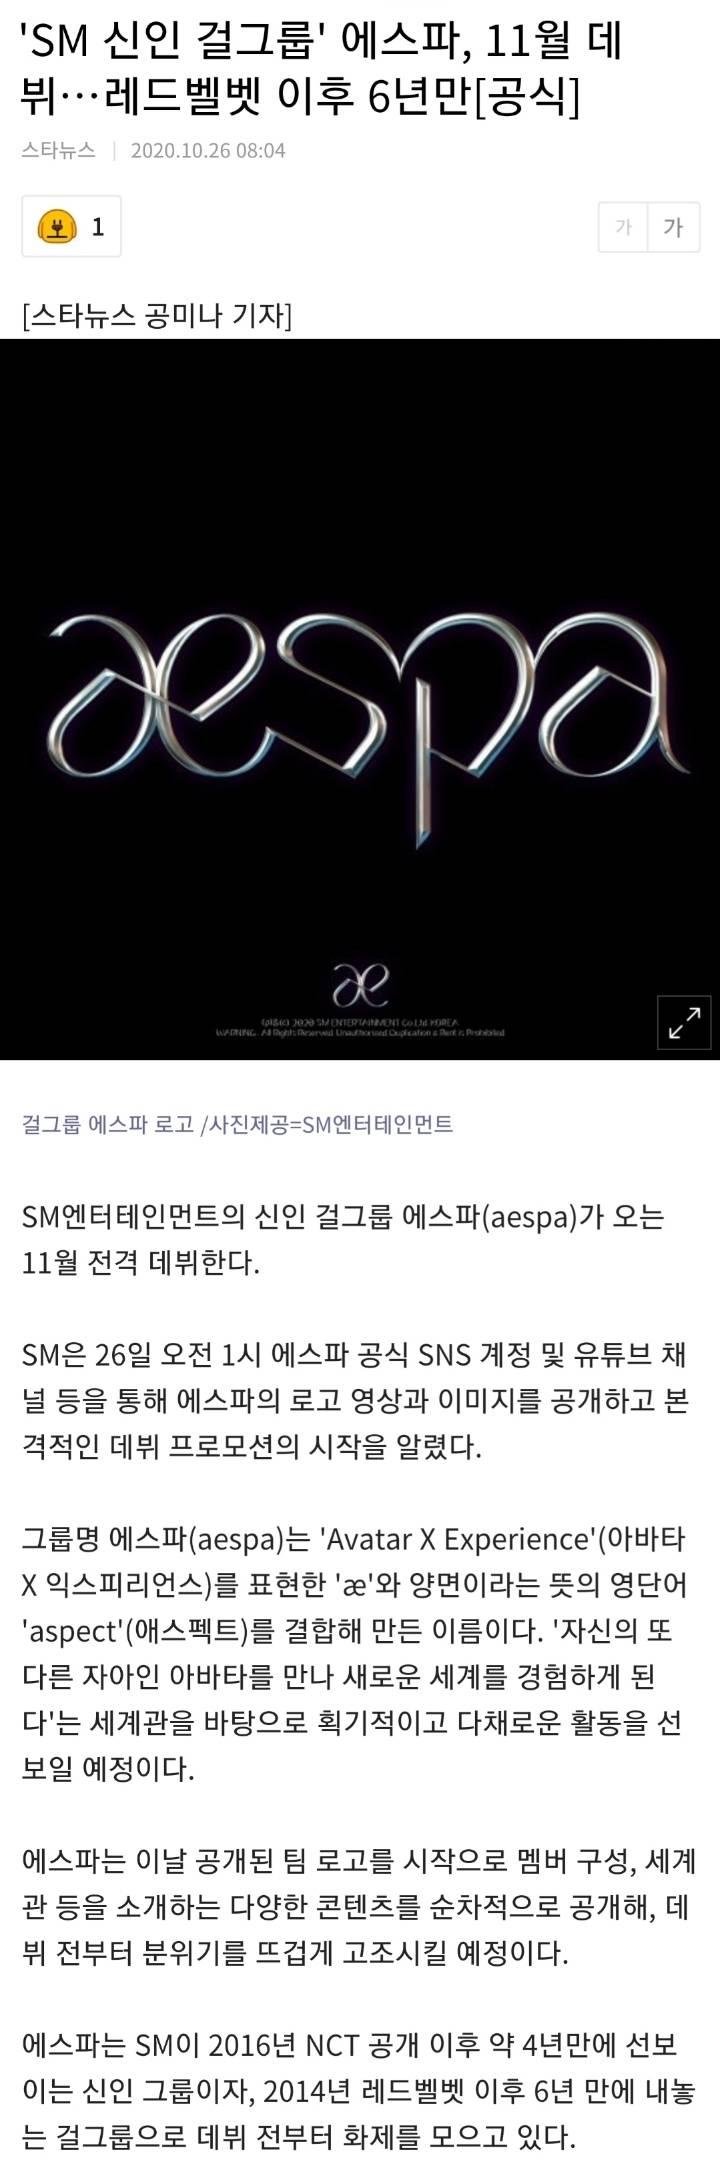 'SM 신인 걸그룹' 에스파, 11월 데뷔…레드벨벳 이후 6년만[공식] | 인스티즈